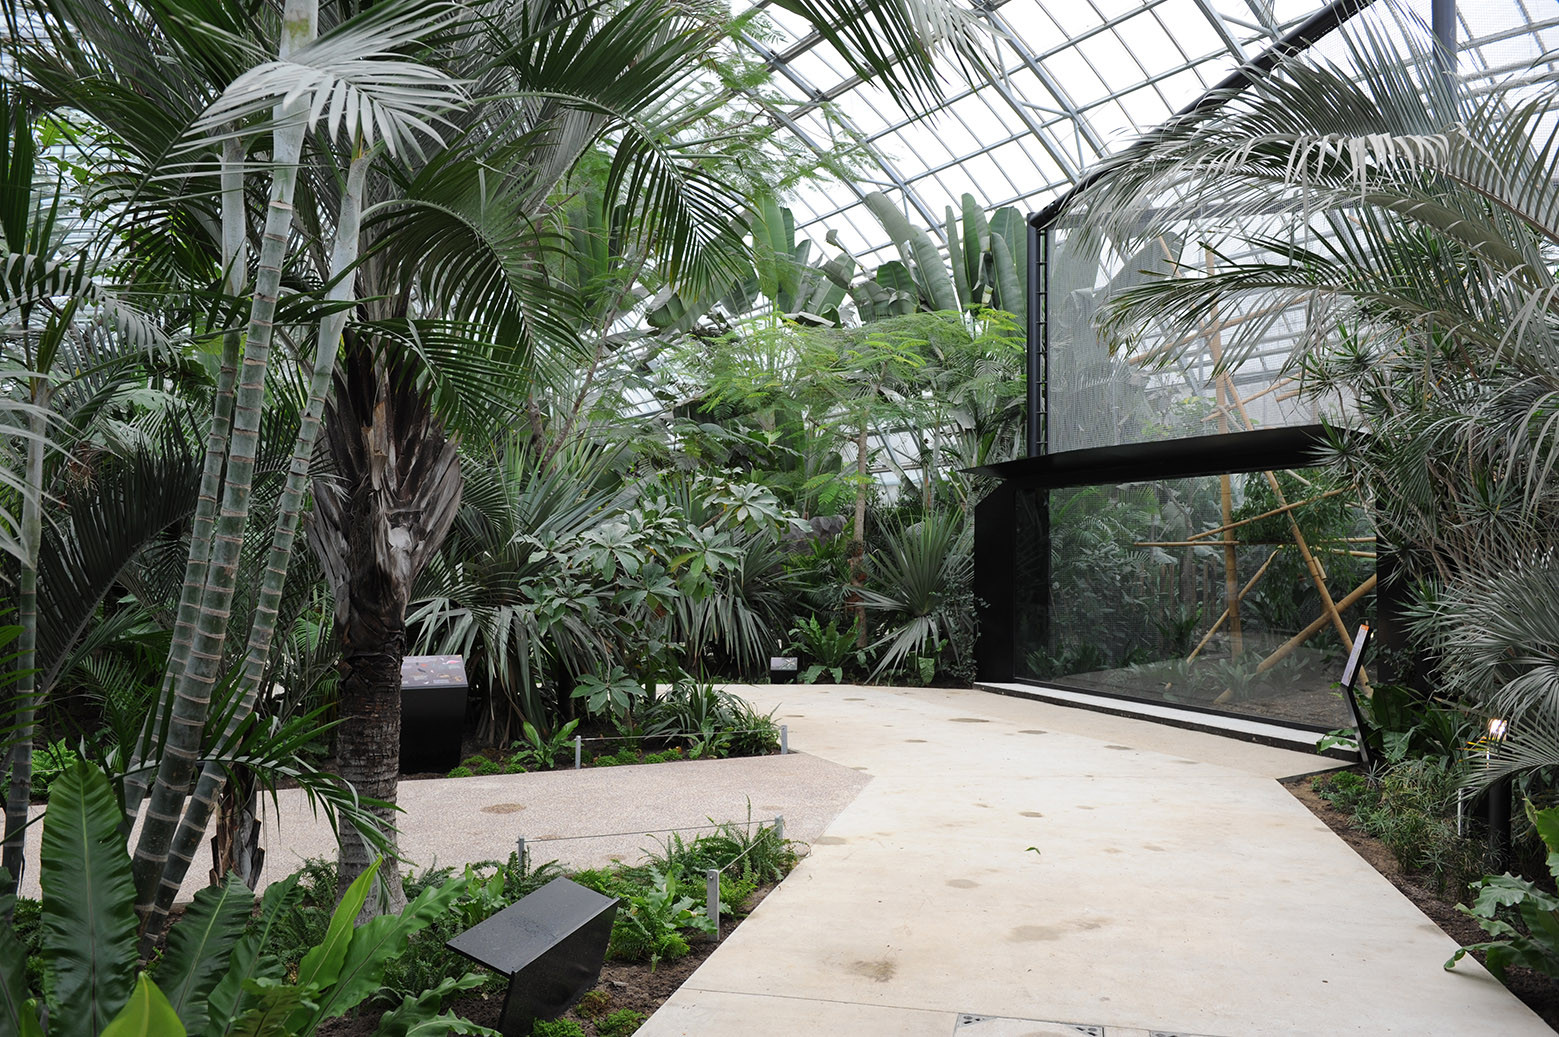 Paris Zoological Park / Bernard Tschumi Urbanists Architects + Veronique Descharrieres, © Claud Cieutat